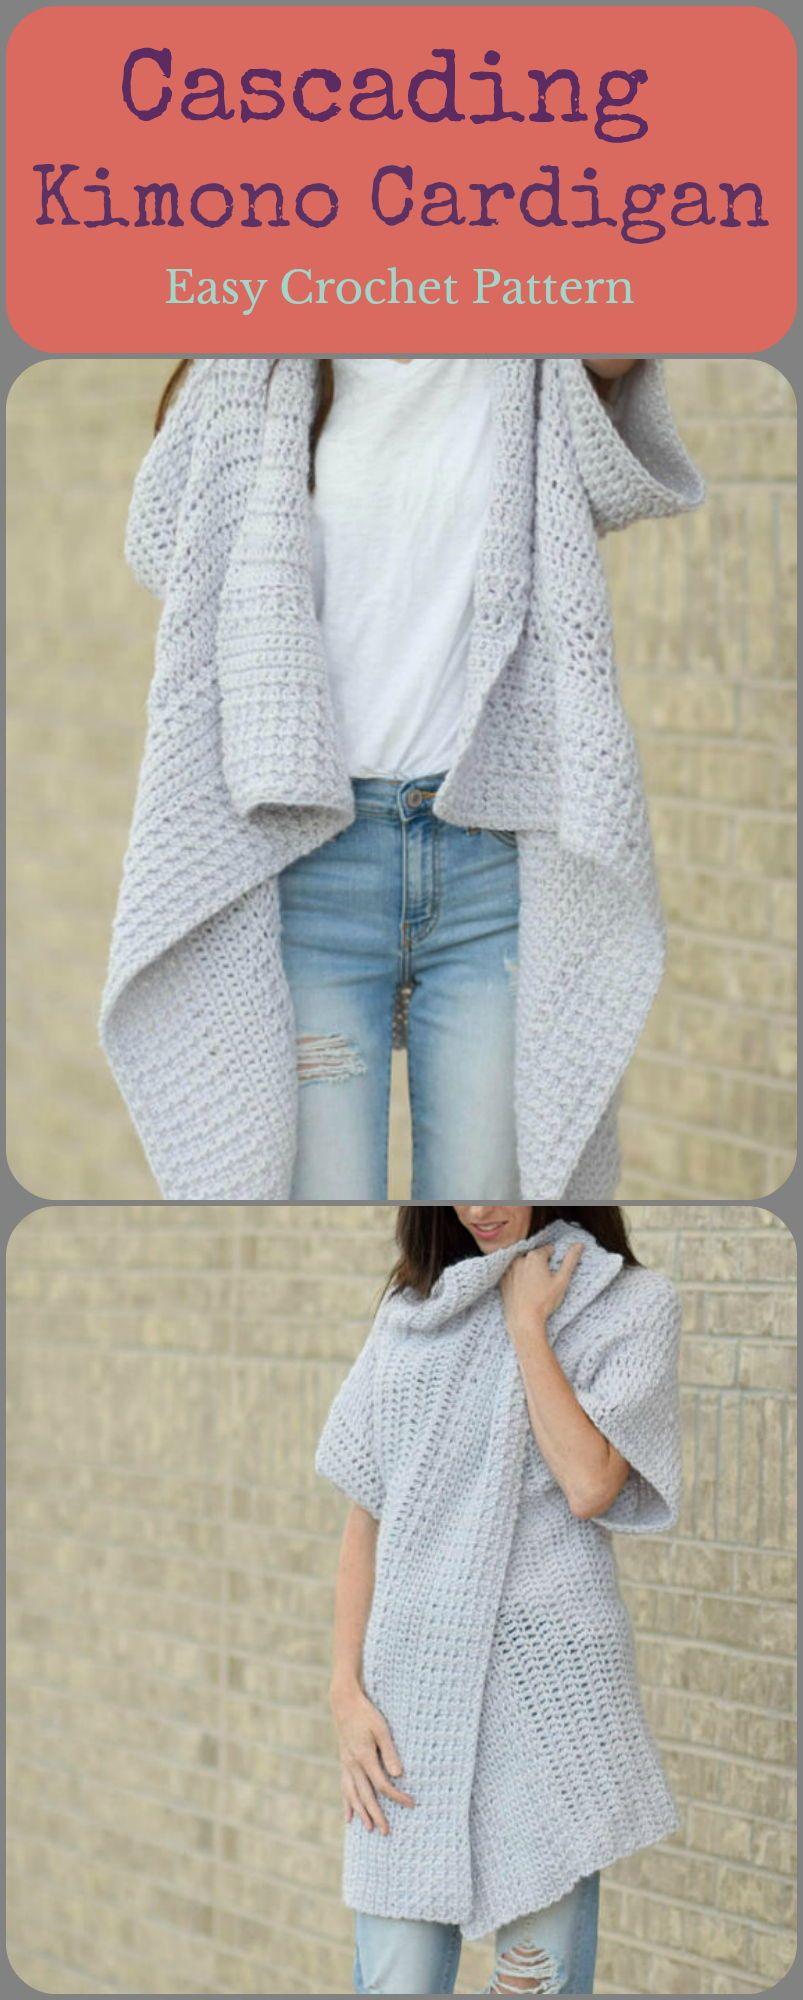 Easy crochet, cascading kimono cardigan #crochet #crochetpattern #ad ...